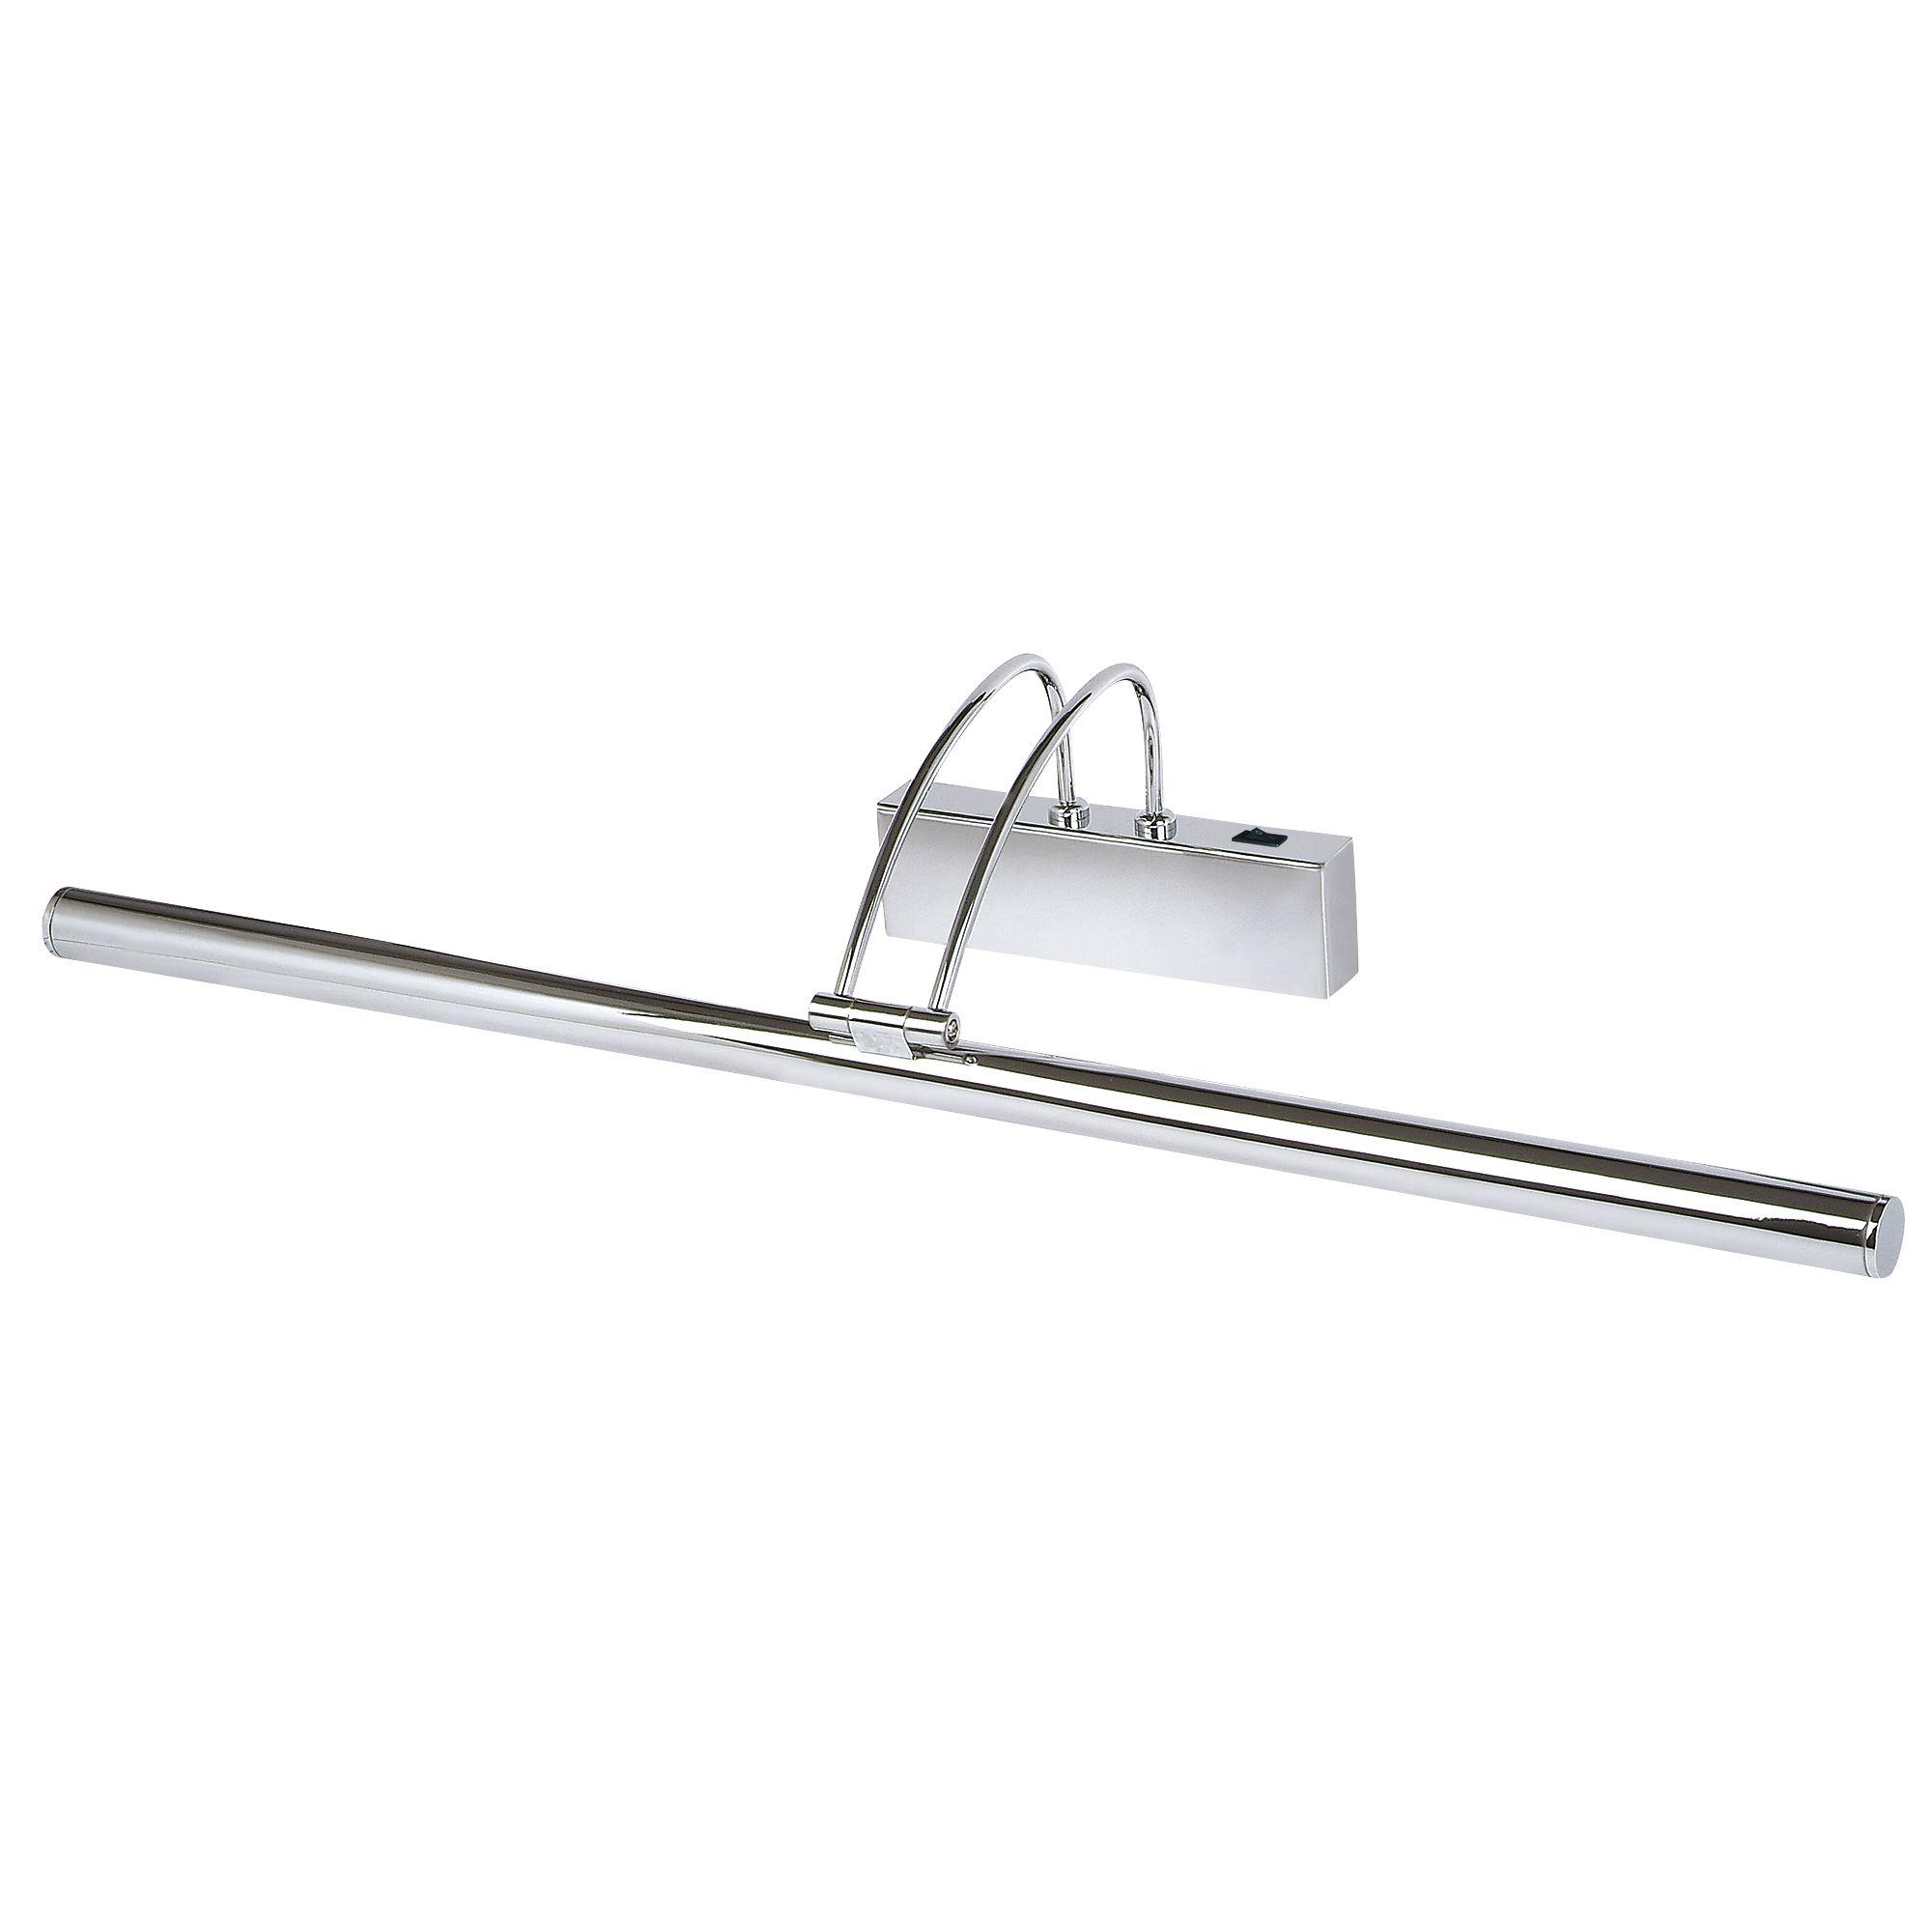 Searchlight LED Picture Lights képmegvilágító